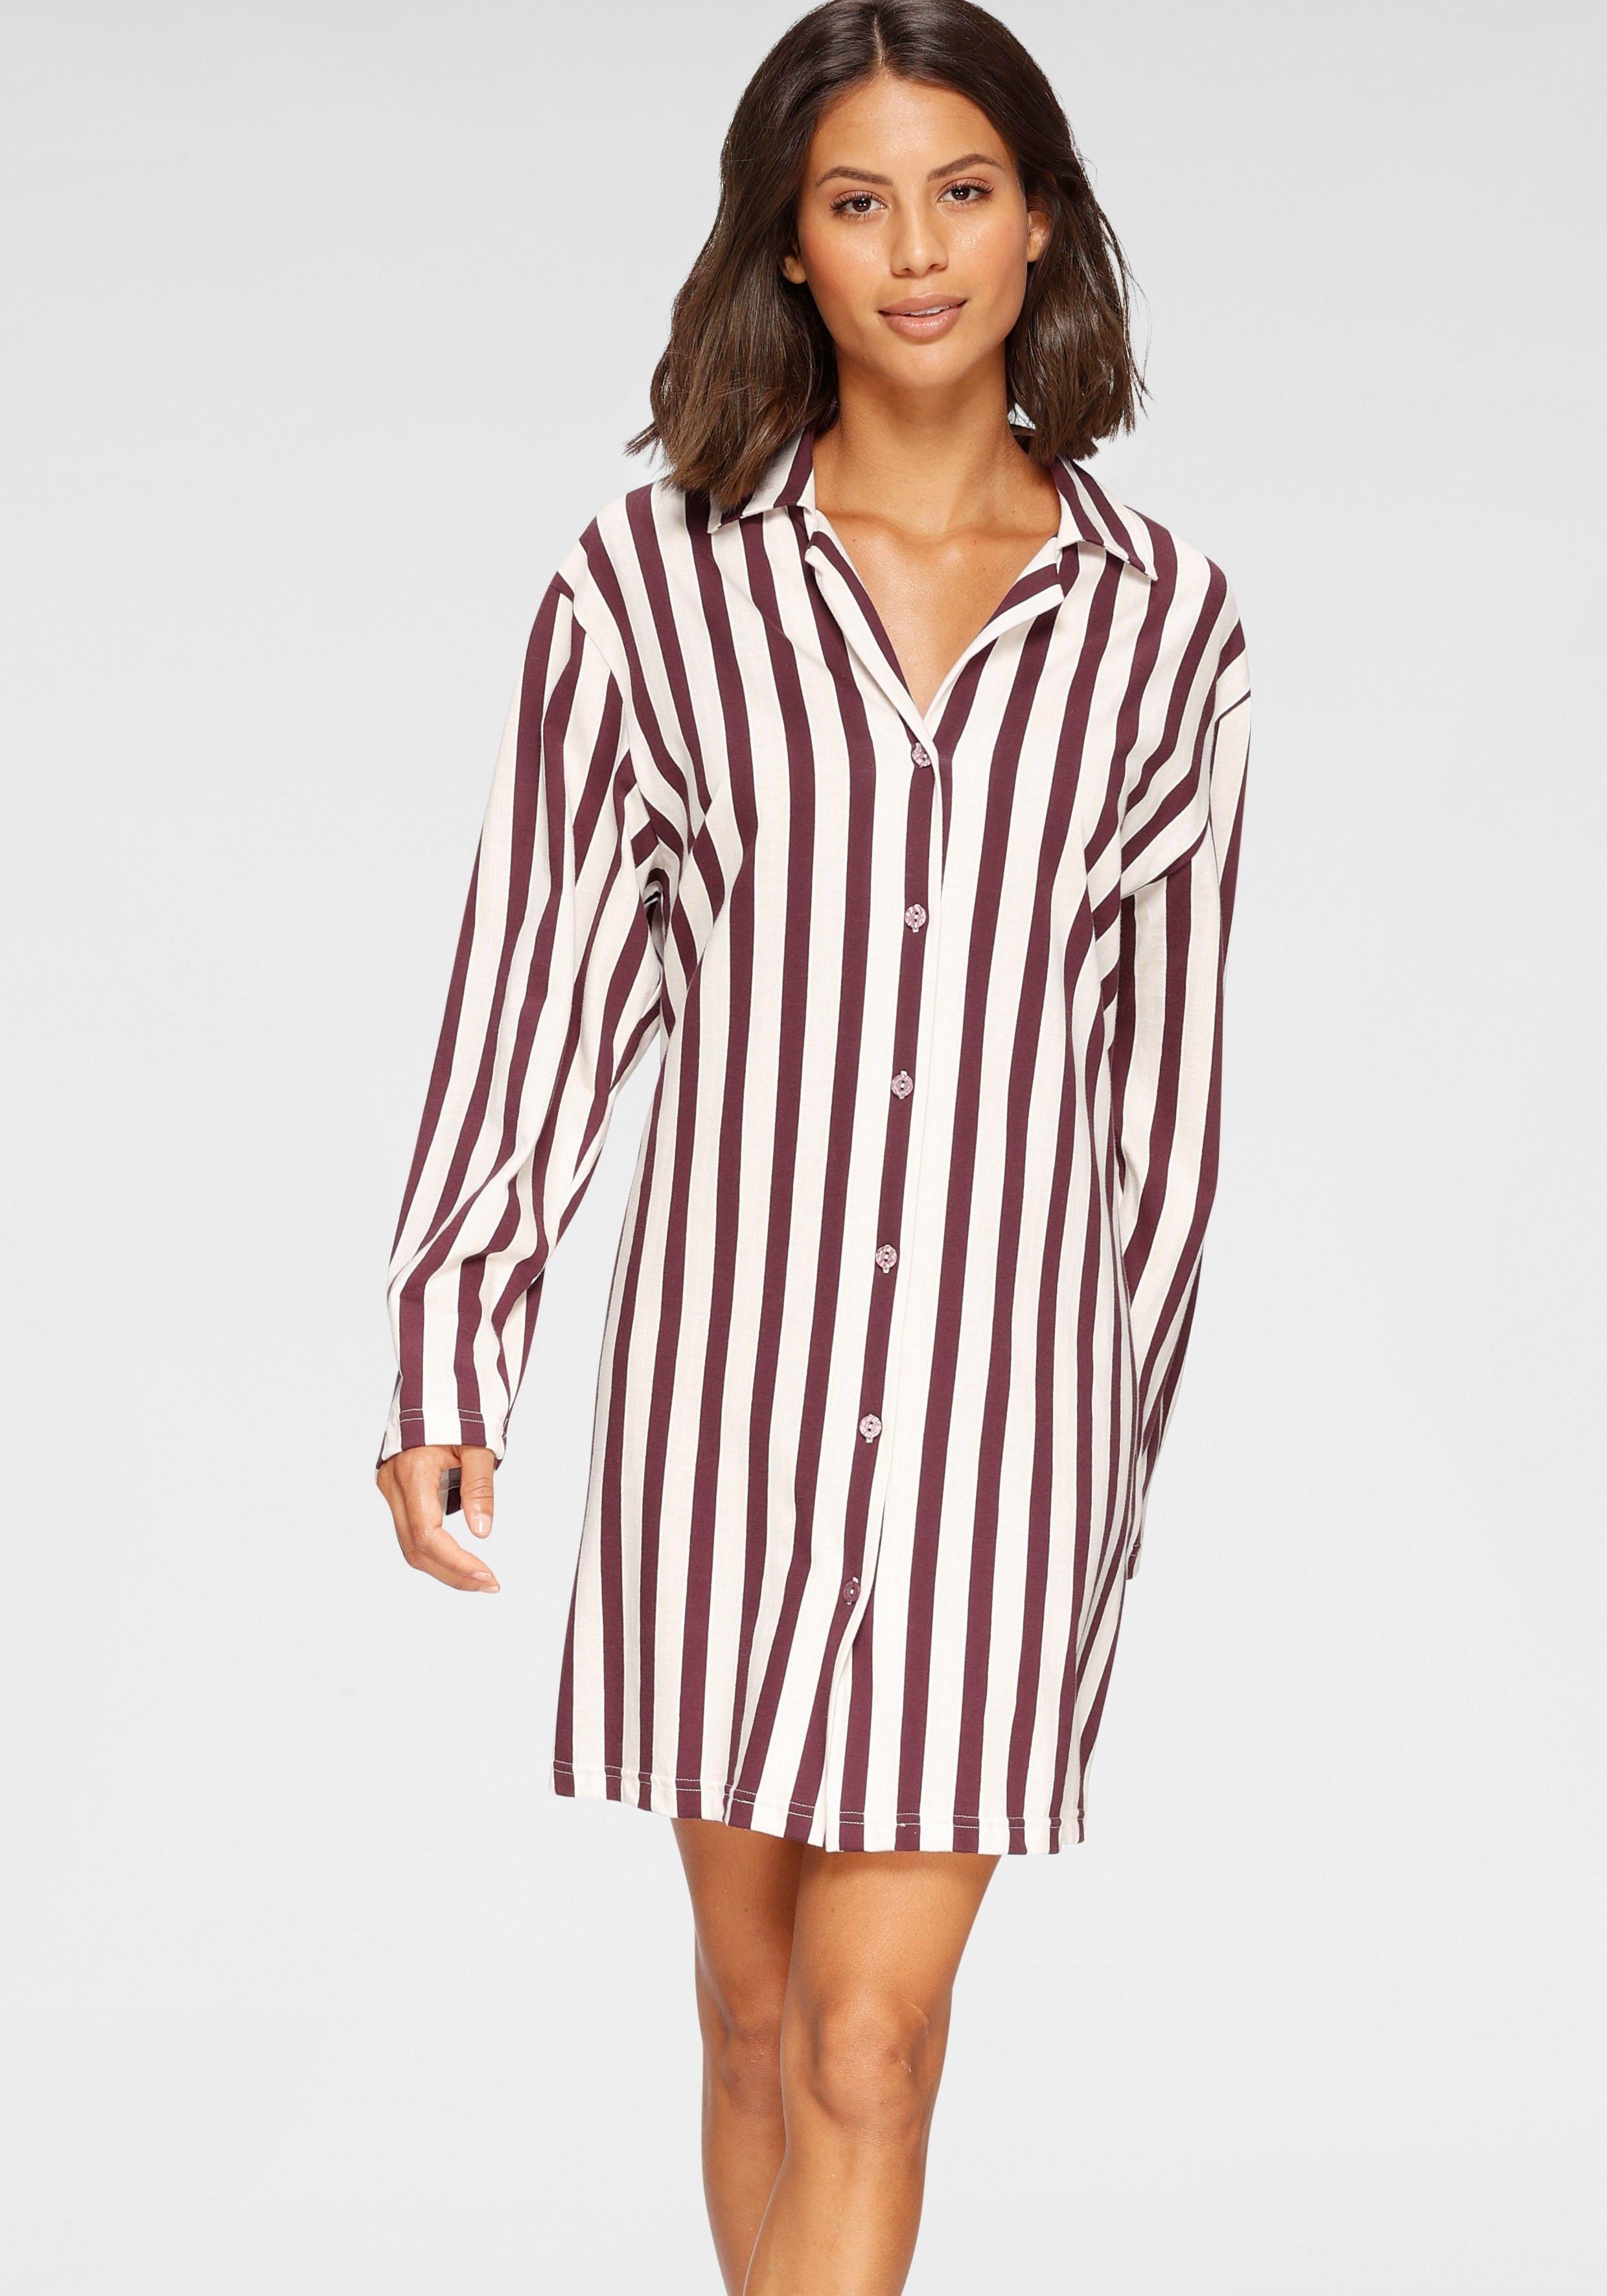 Cybèle nachthemd nu online bestellen